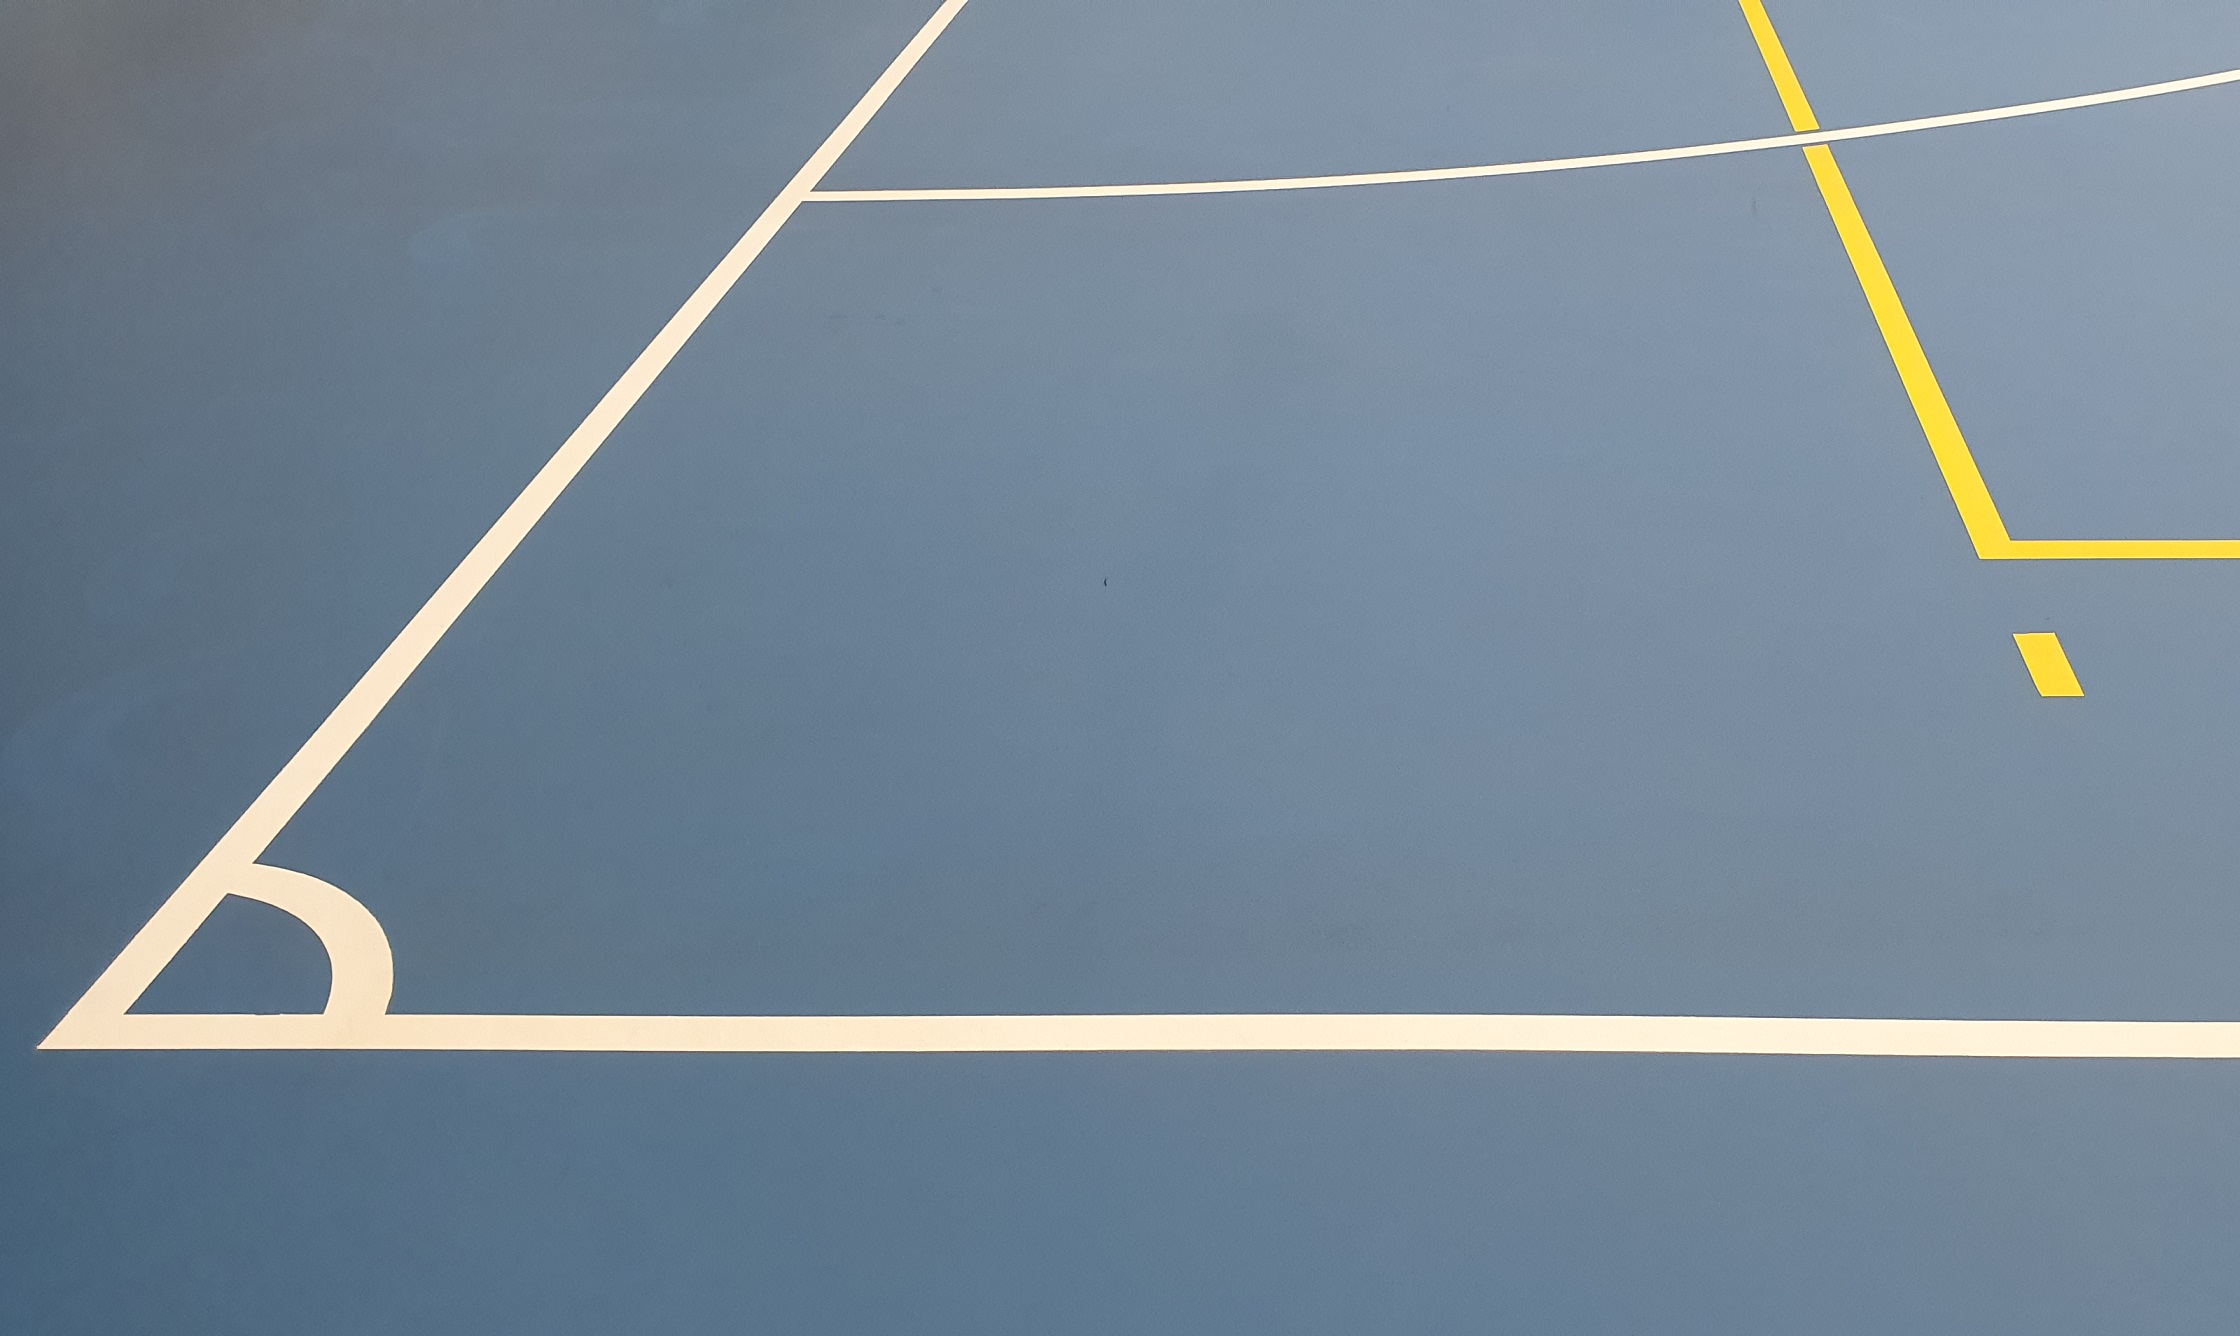 SCEGGS School Synthetic Basketball Court – 3